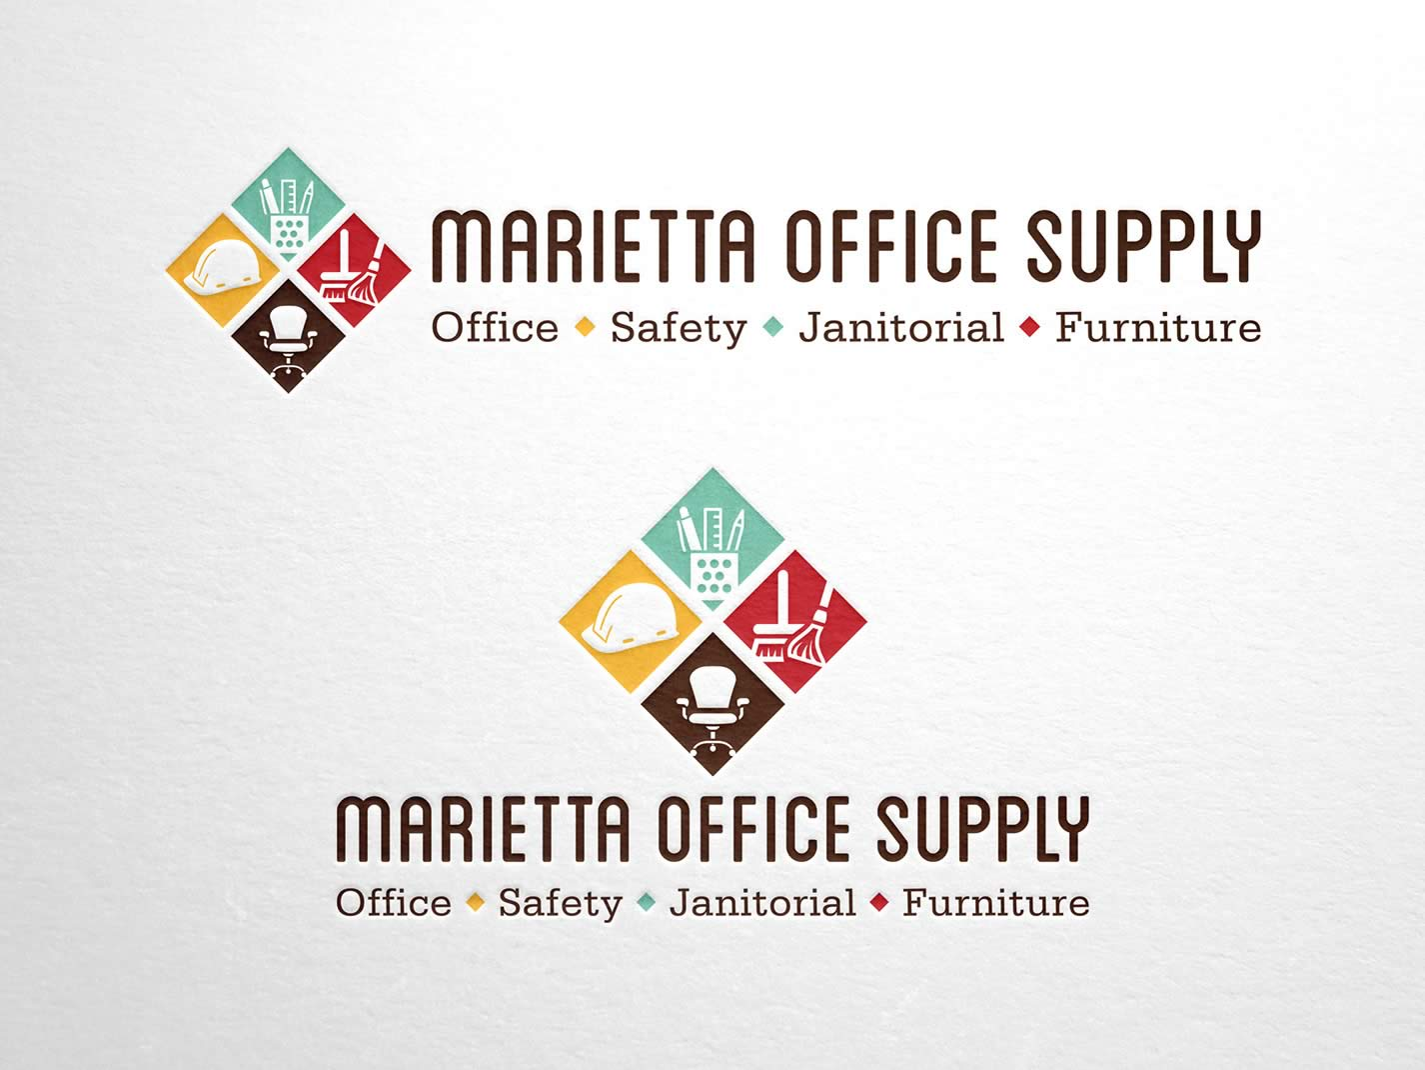 Marietta Office Supply Branding